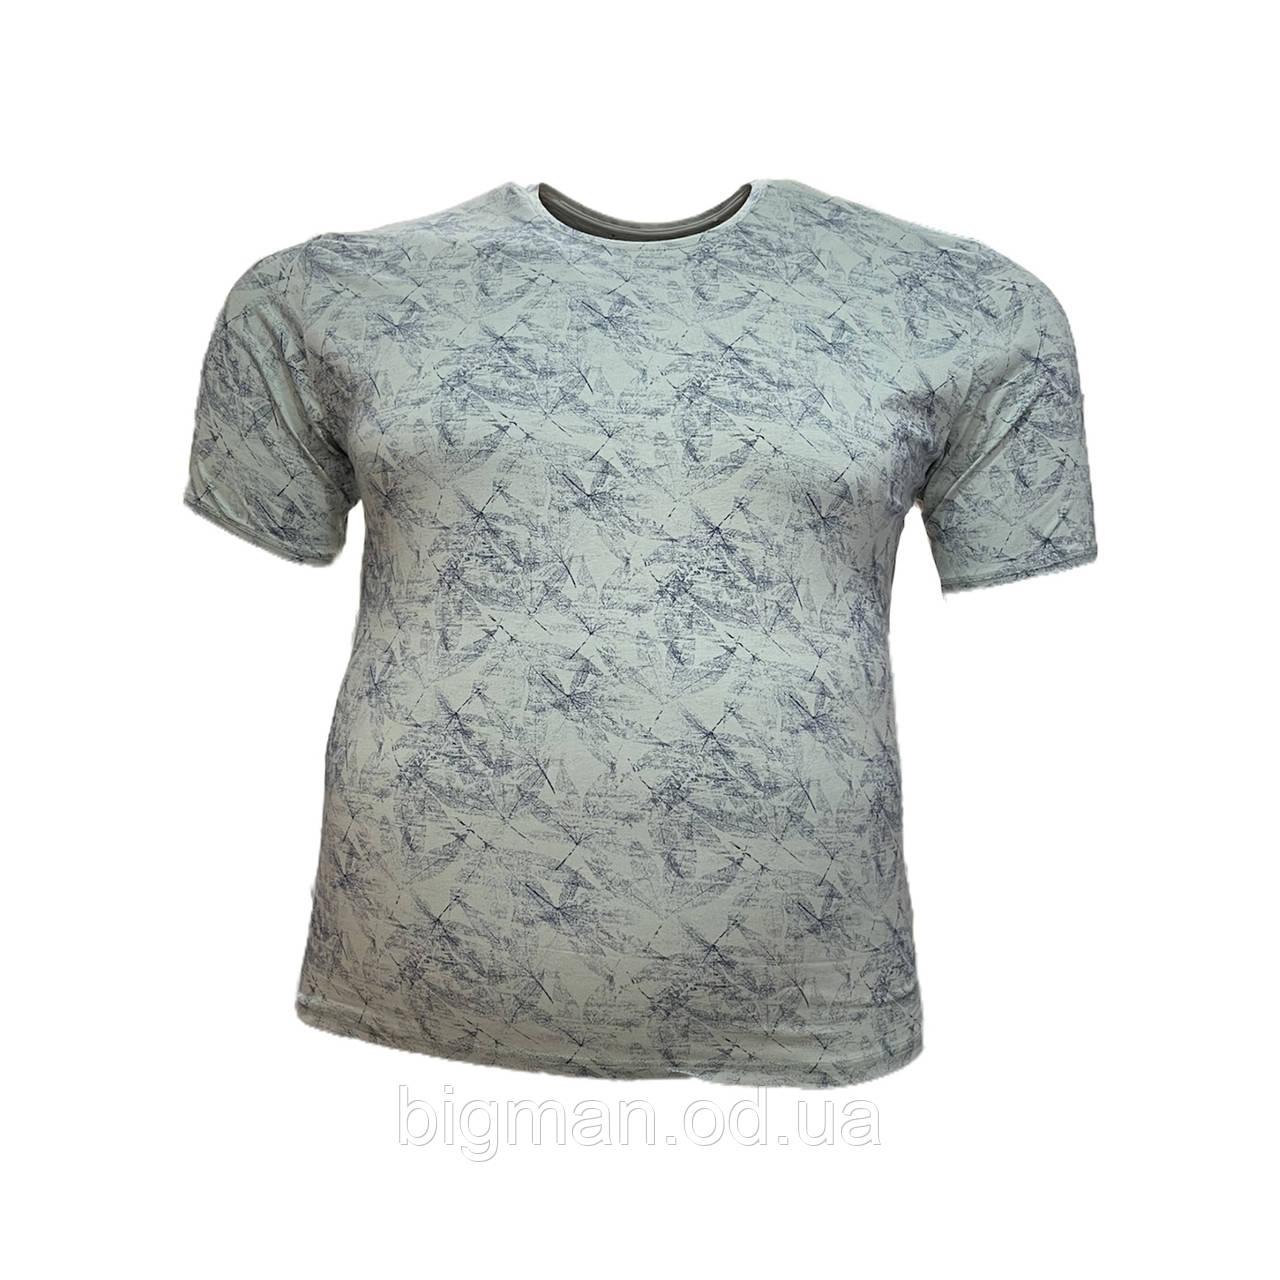 Мужская батальная футболка на резинке Jean Piere 12121 6XL 7XL 8XL бирюза большие размеры Турция